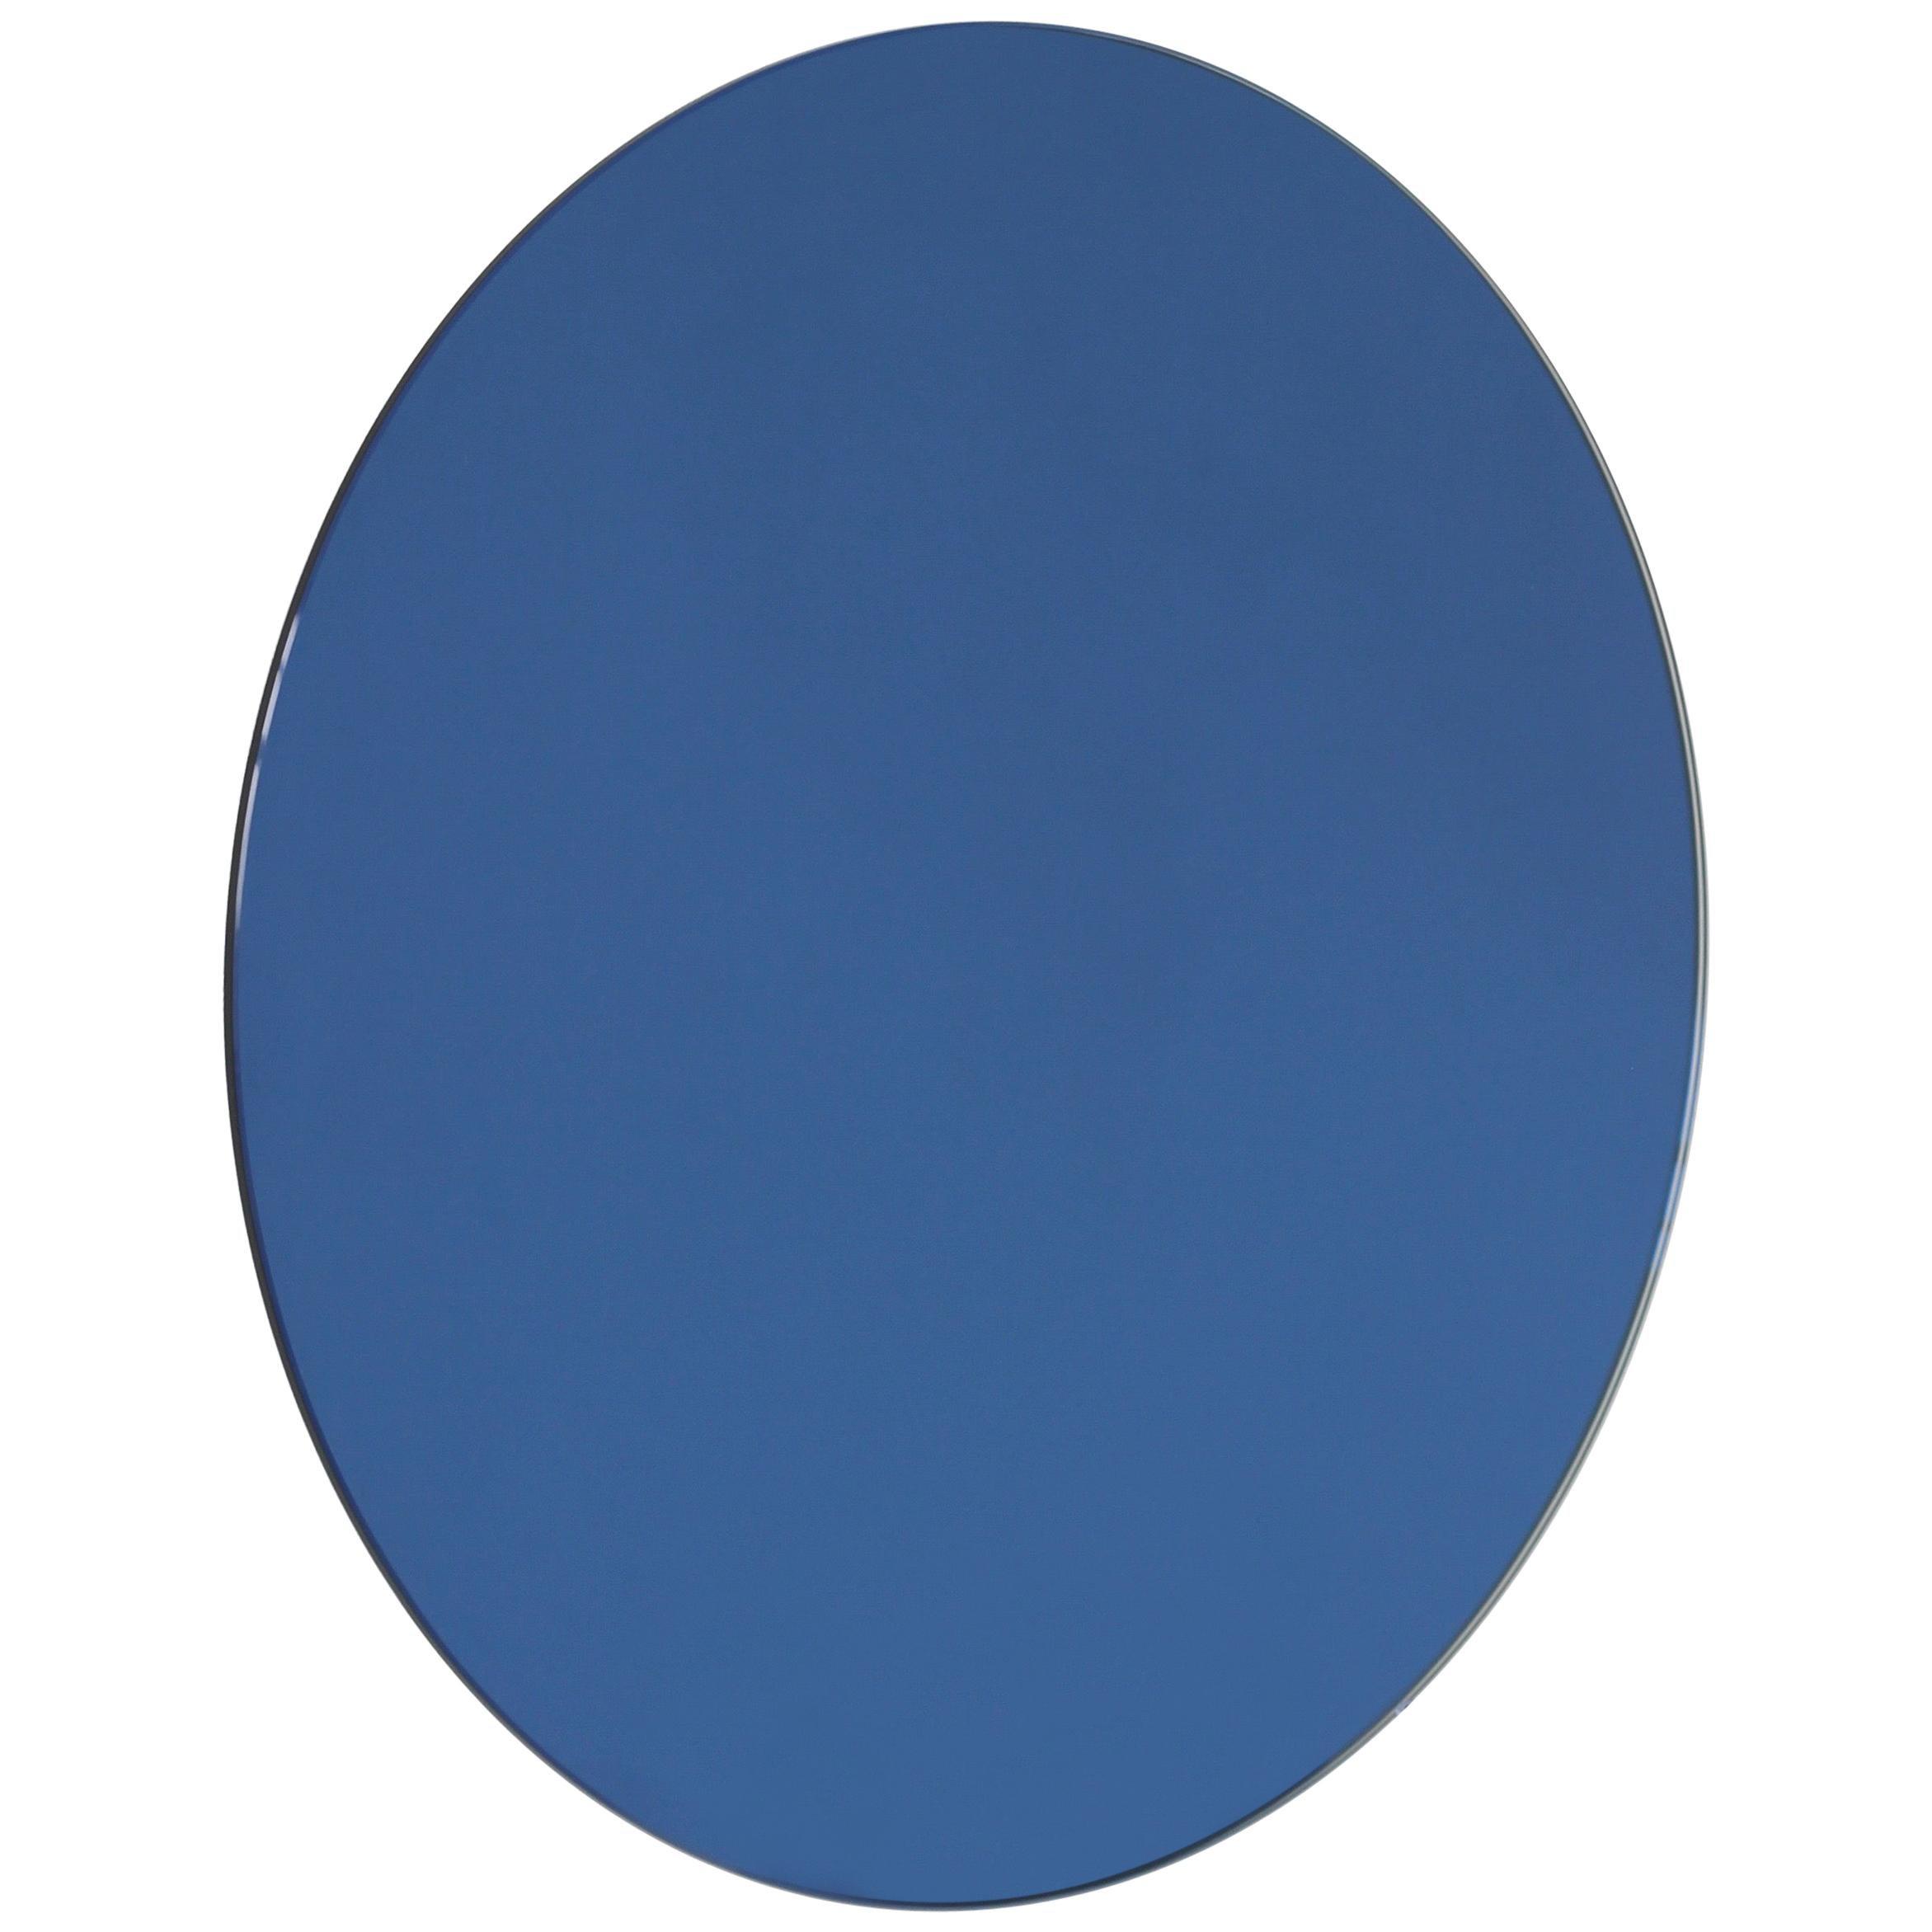 Orbis™ Blue Tinted Round Bespoke Frameless Mirror - Oversized, Extra Large